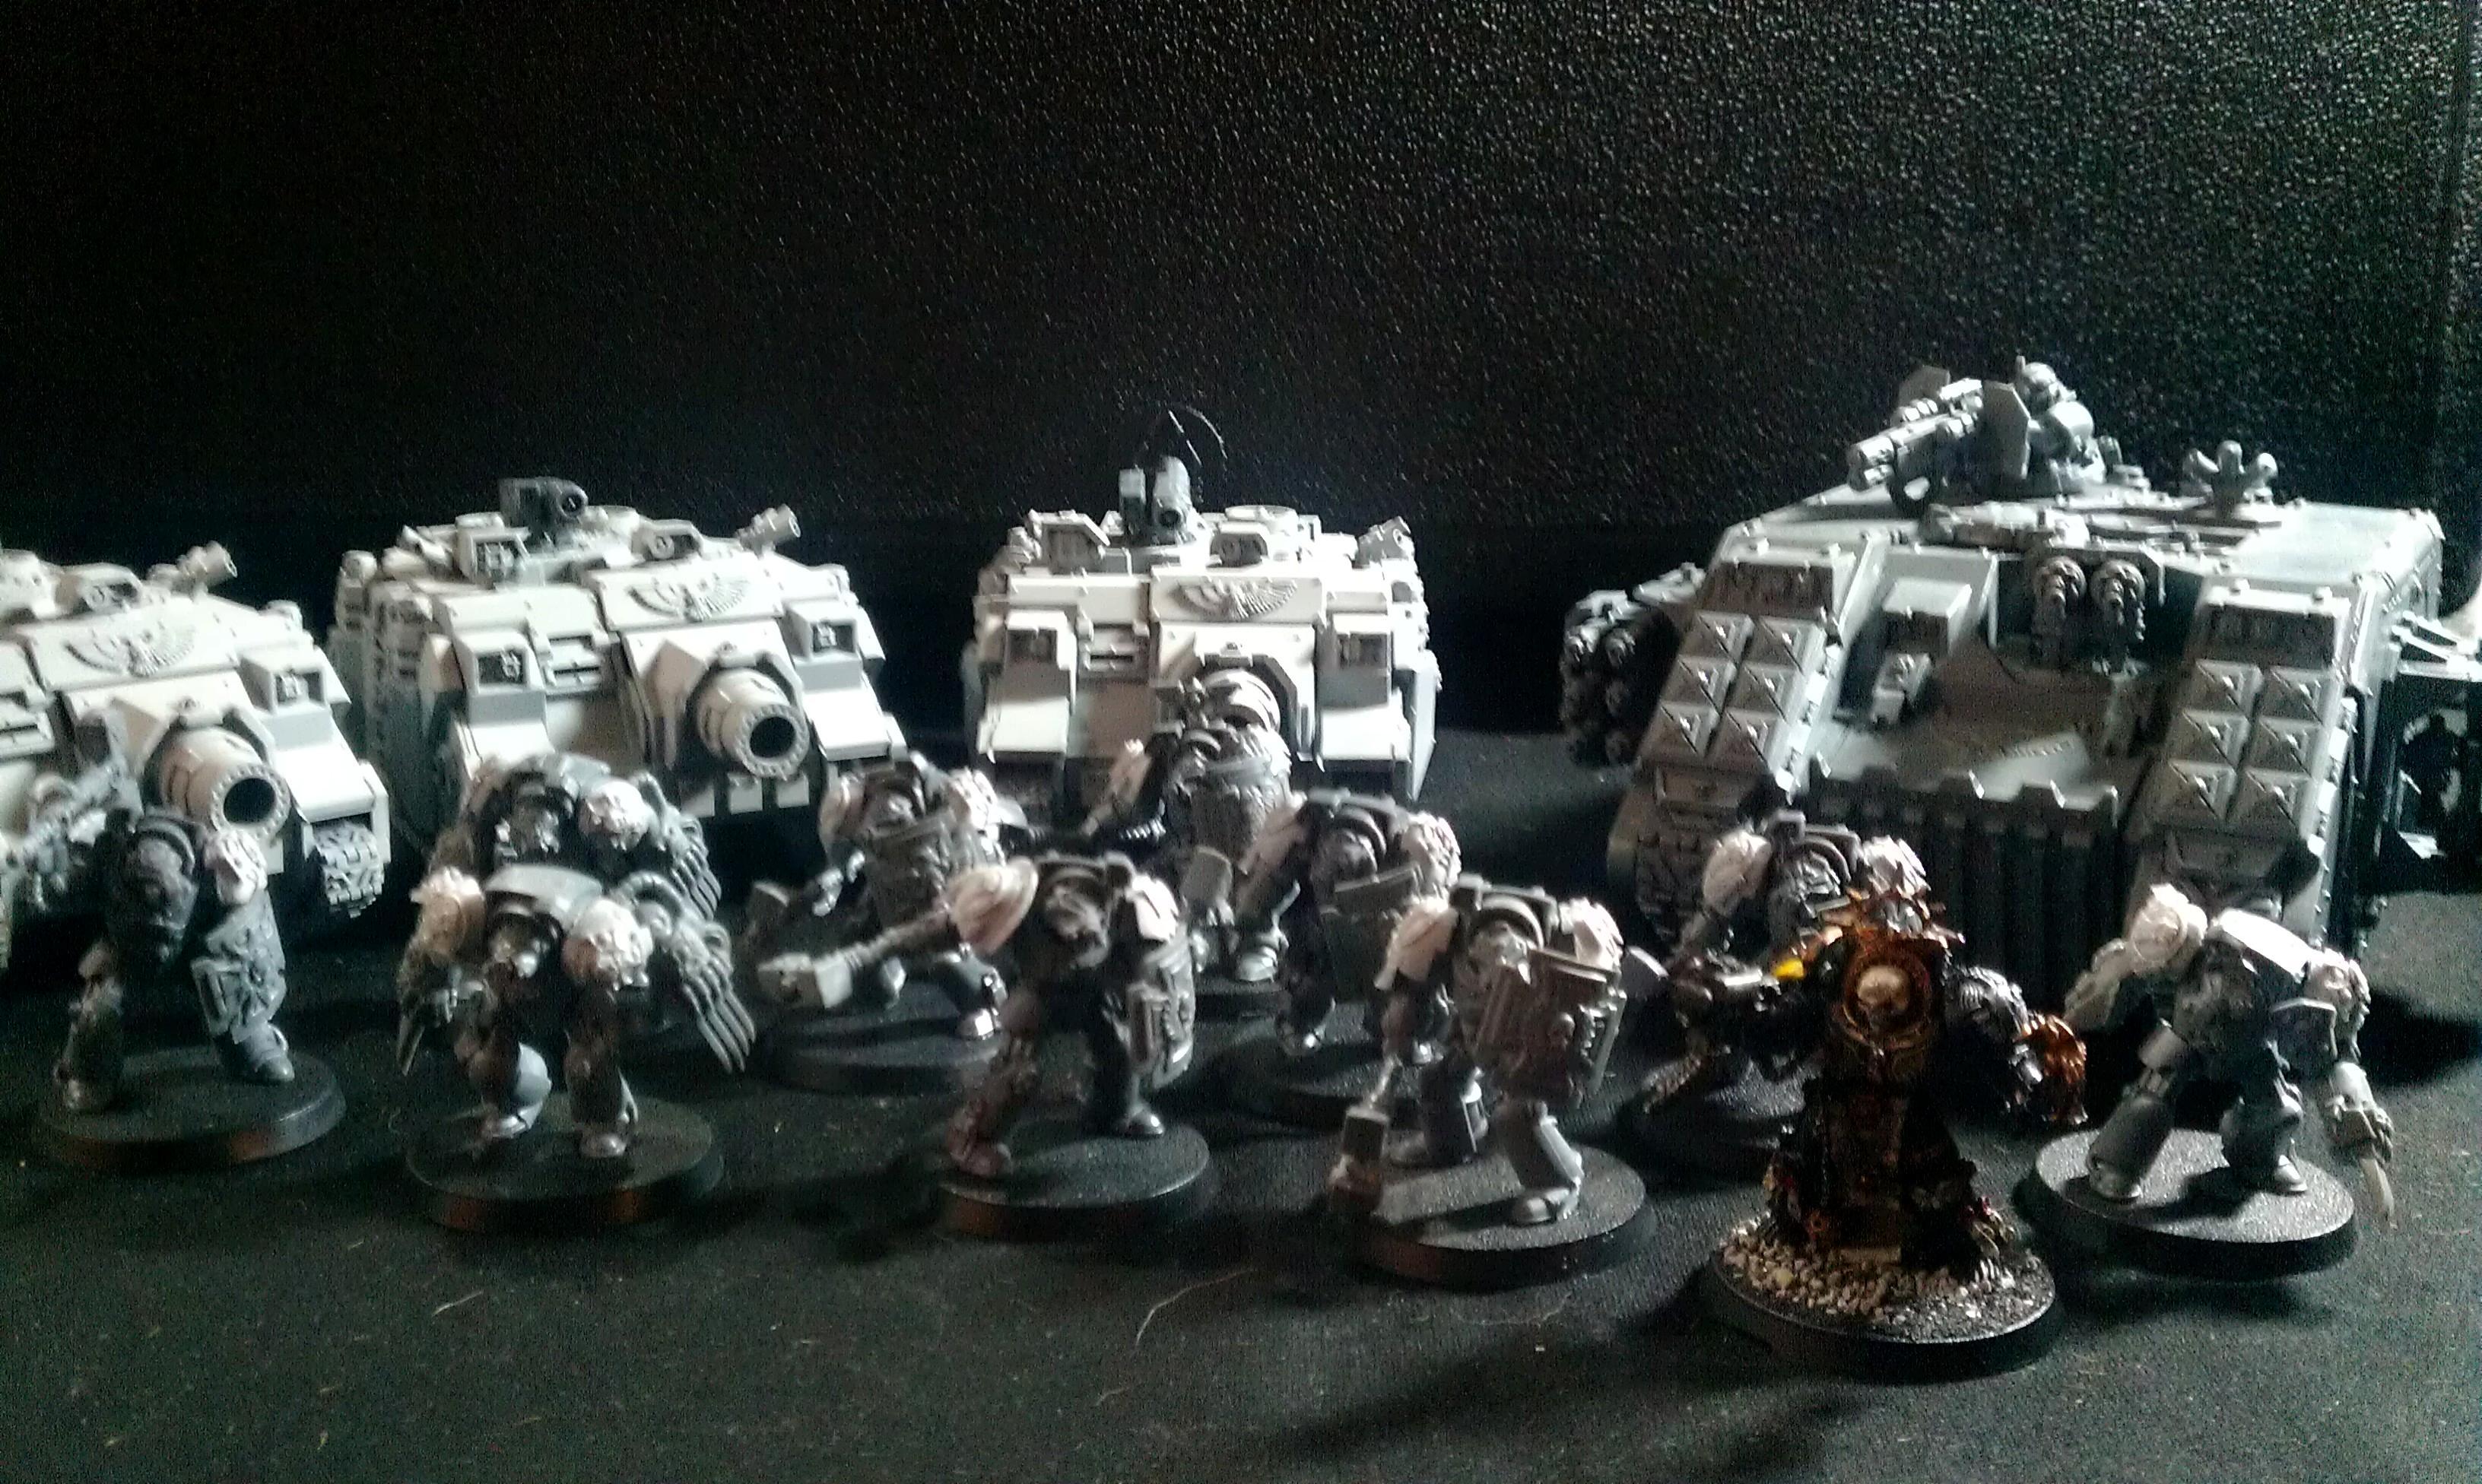 Chaplain, Imperial Fists, Land Raider Redeemer, Terminator Armor, Vindicator